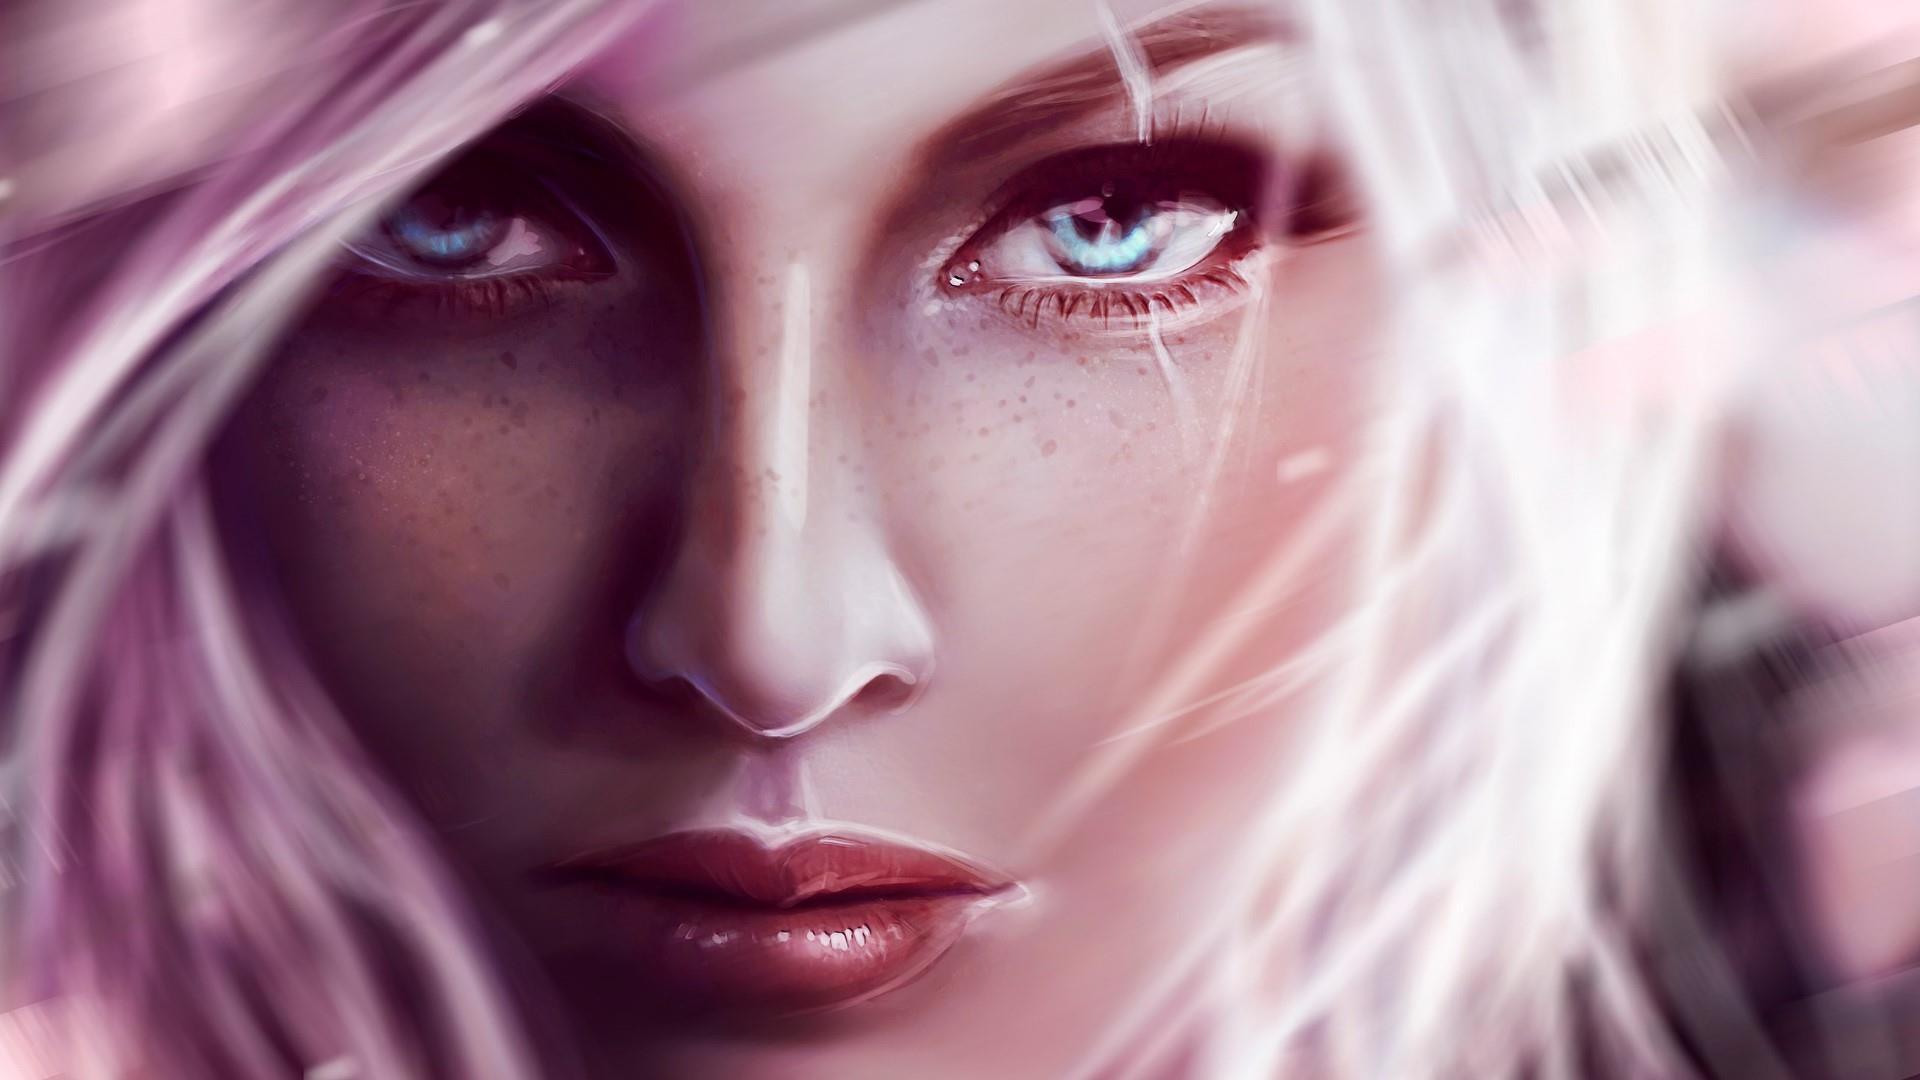 Artistic blonde girl face wallpaper